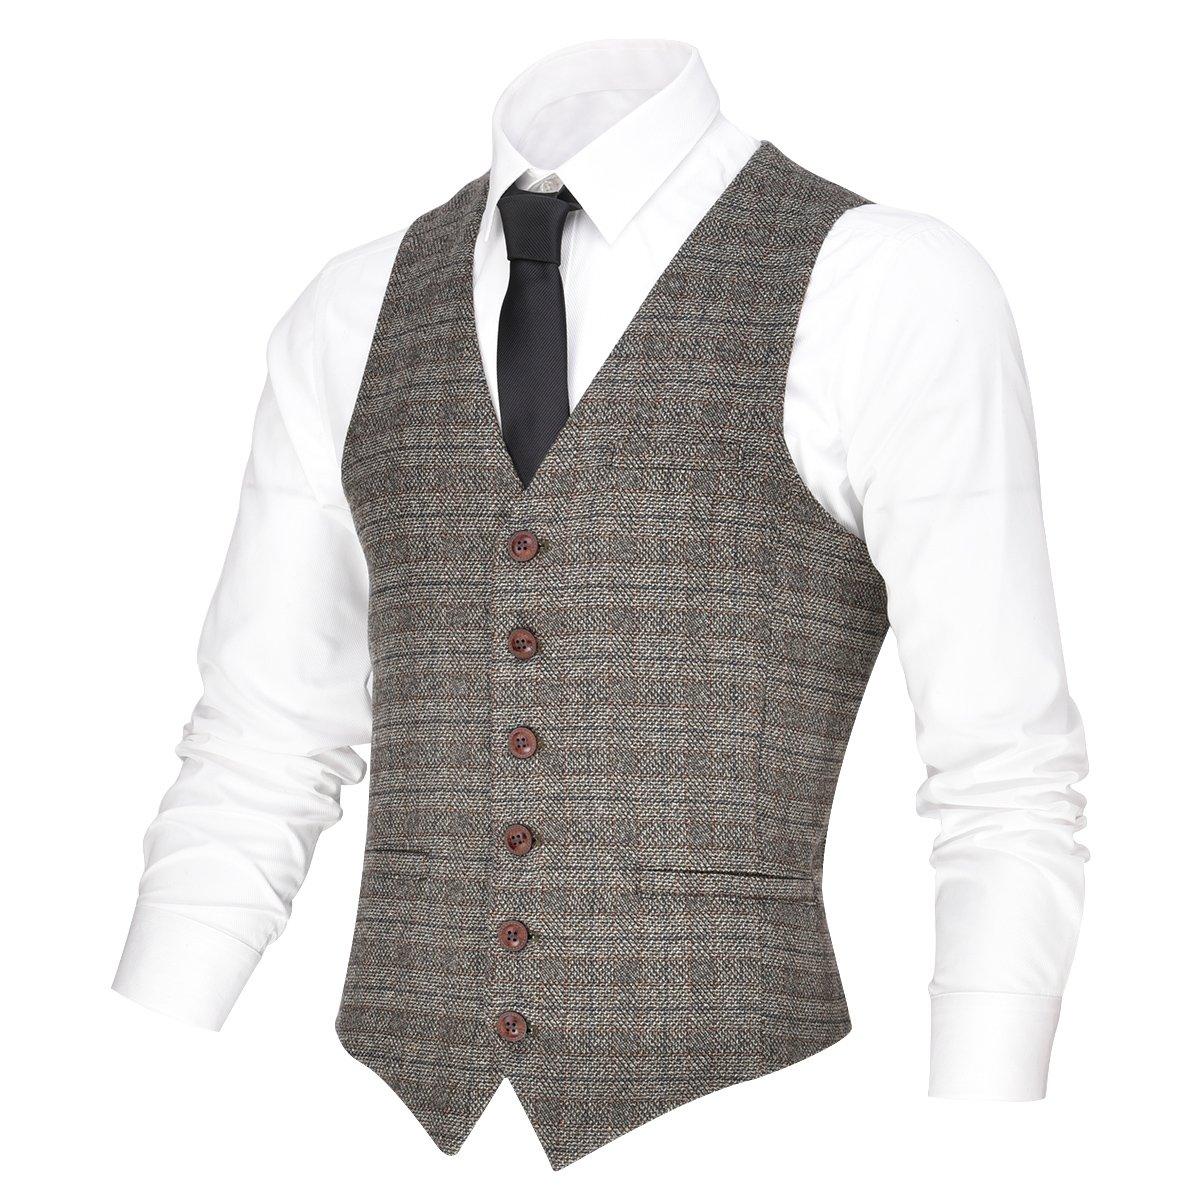 VOBOOM Men's V-Neck Suit Vest Casual Slim Fit Dress 6 Button Vest Waistcoat (Brown, M) by VOBOOM